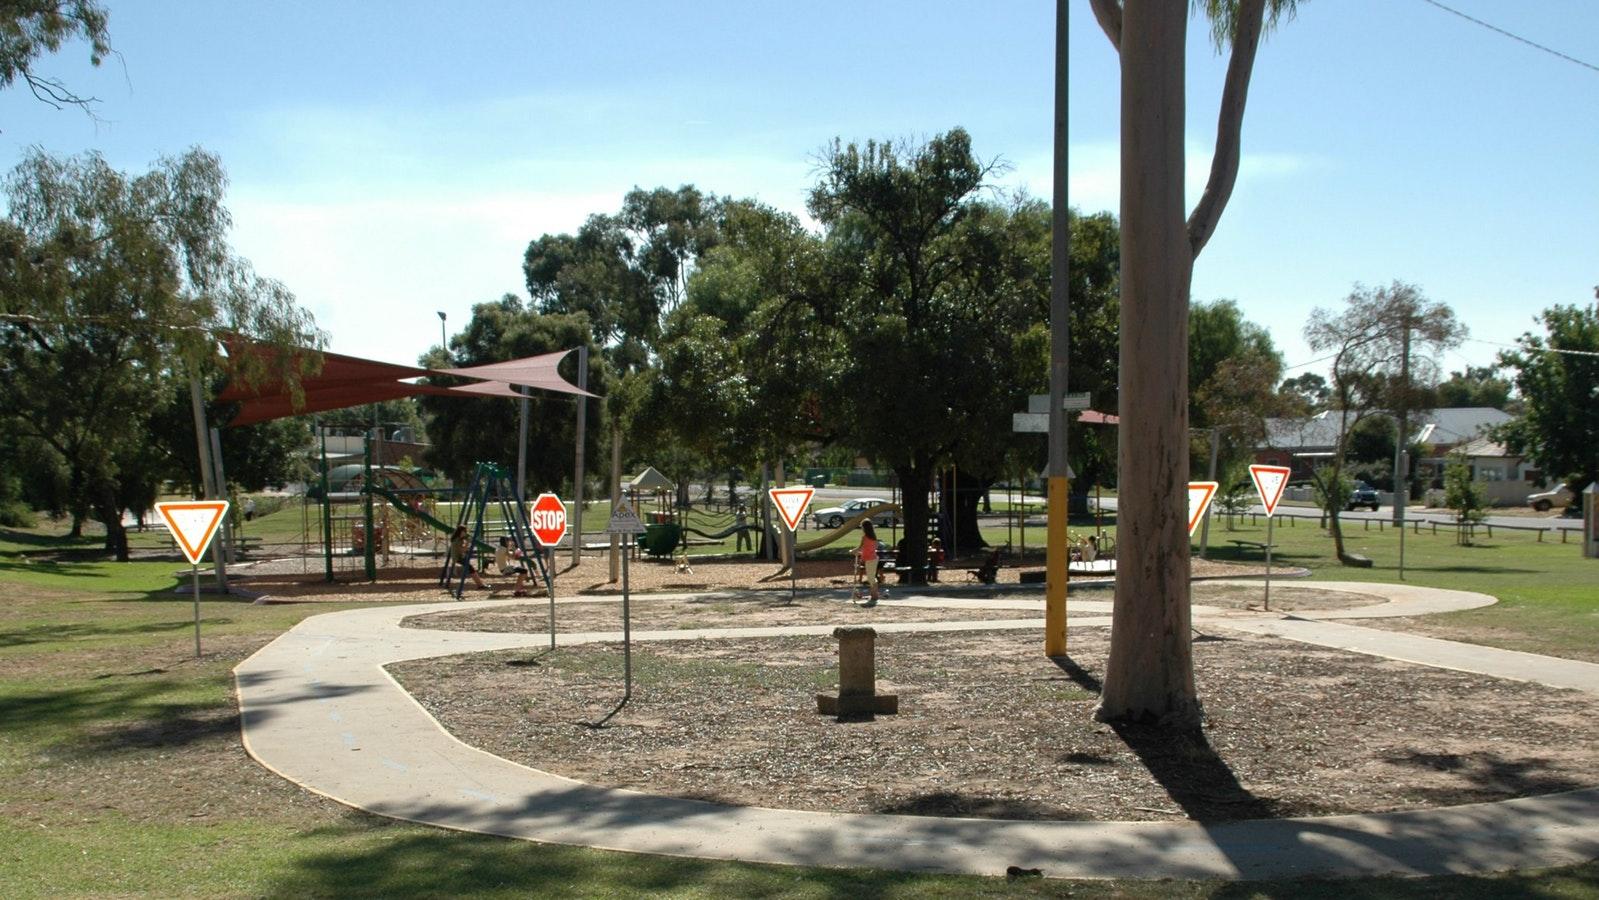 Playground and little bike track